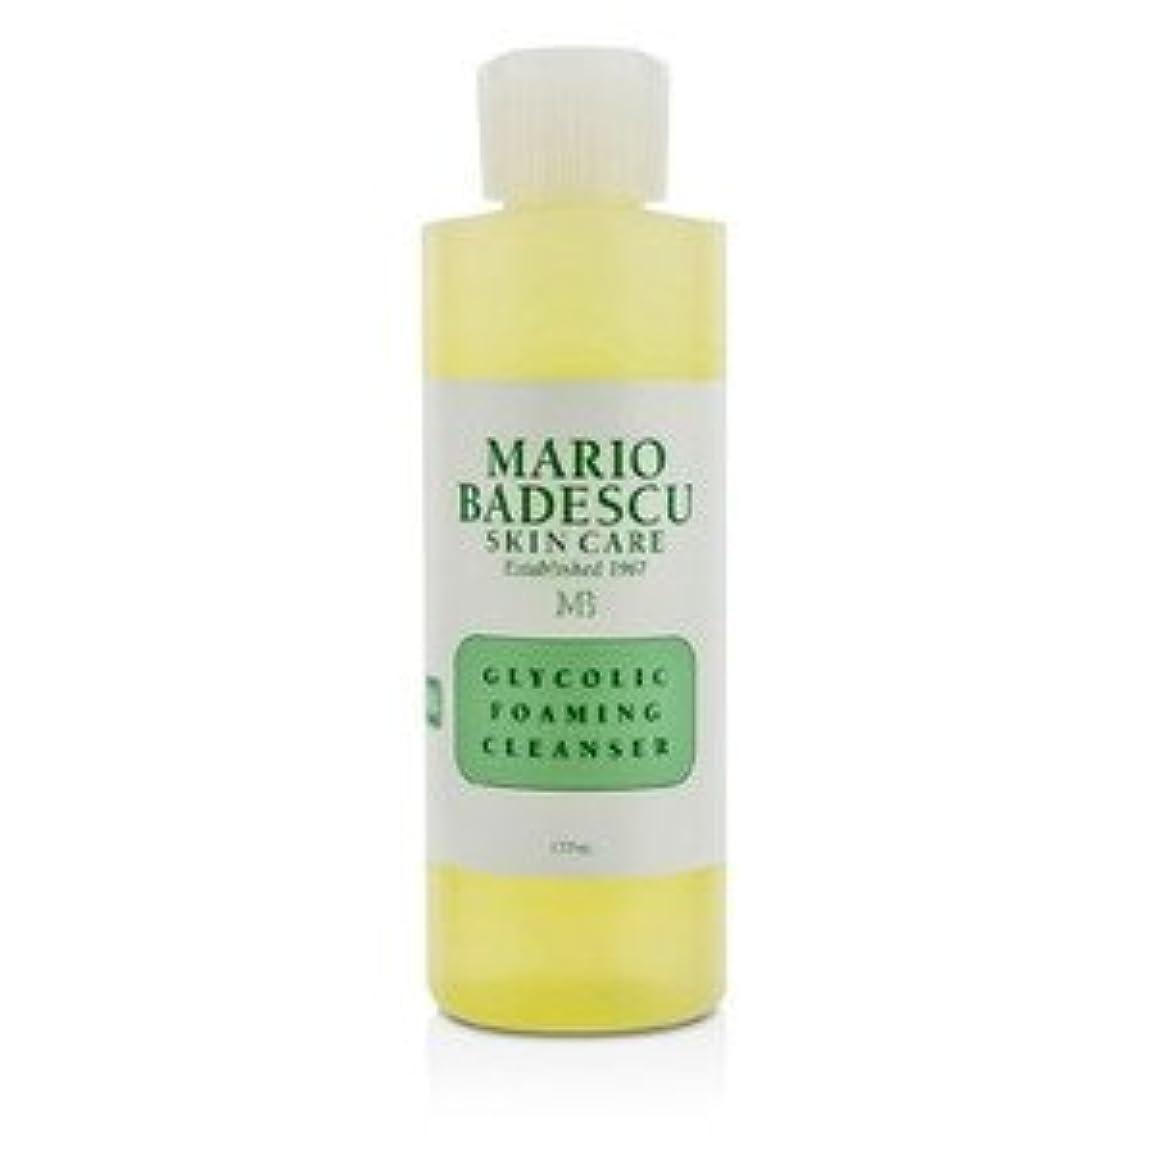 MARIO BADESCU(マリオ バデスク) グリコリック フォーミング クレンザー 177ml/6oz [並行輸入品]